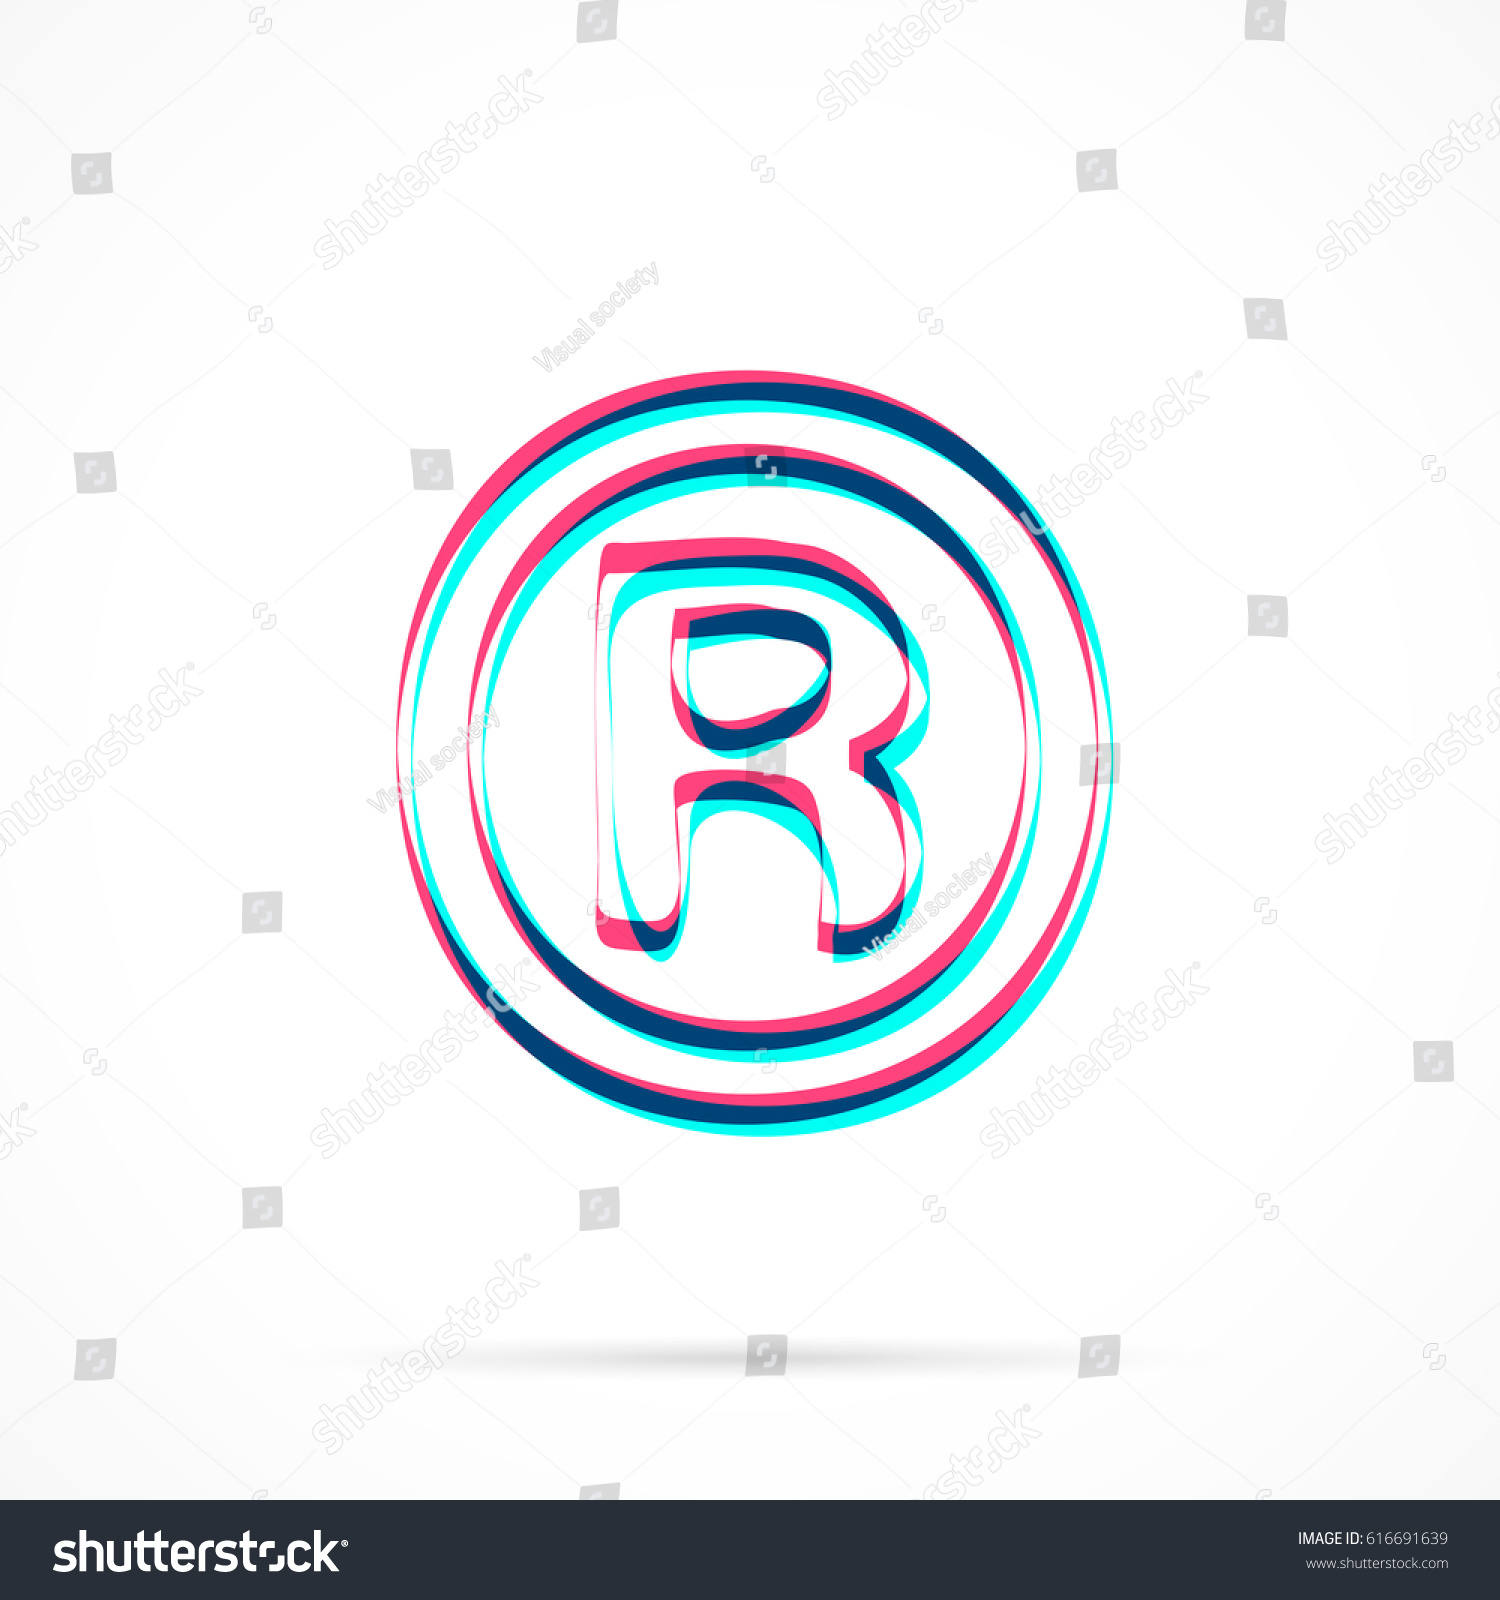 R registered trademark symbol hand drawn stock vector 616691639 r registered trademark symbol hand drawn stock vector 616691639 shutterstock biocorpaavc Gallery